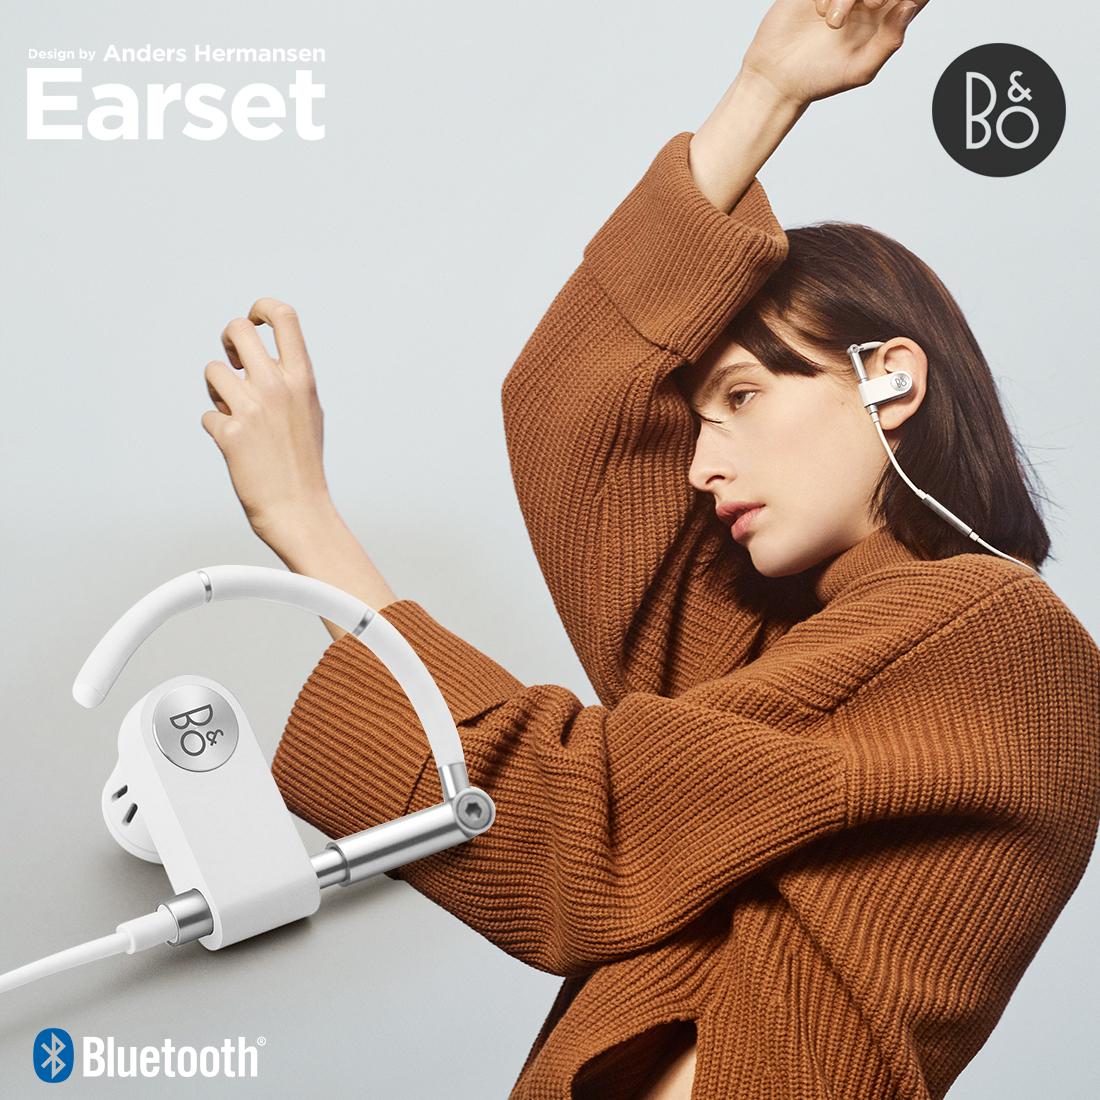 ●●【B&O オリジナルプレゼント付き】【B&O Play】Beoplay EARSET ワイヤレス イヤフォン BANG & OLUFSEN Bluetooth 4.2 ブルートゥース 密閉型 高音質【コンビニ受取対応商品】